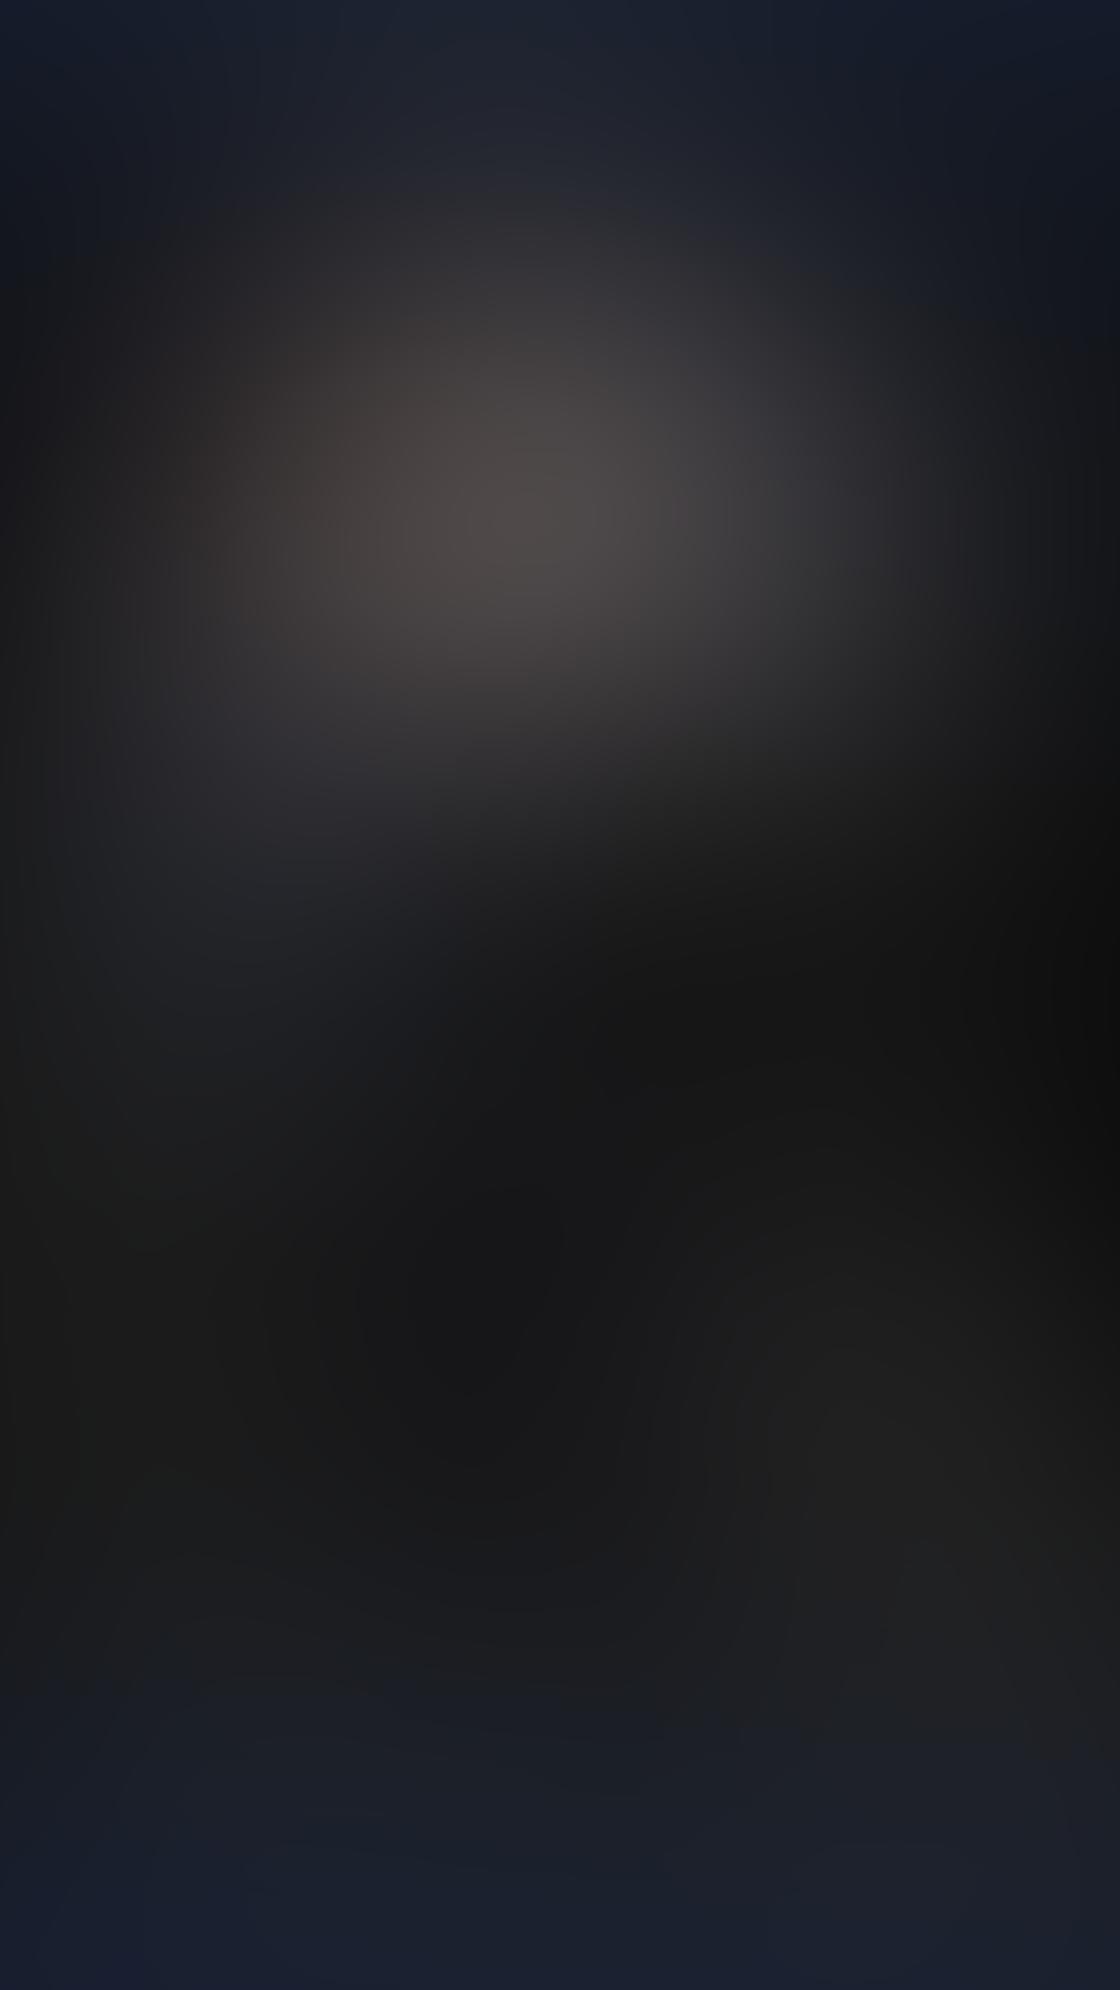 iPhone Photo Editing Workflow 37